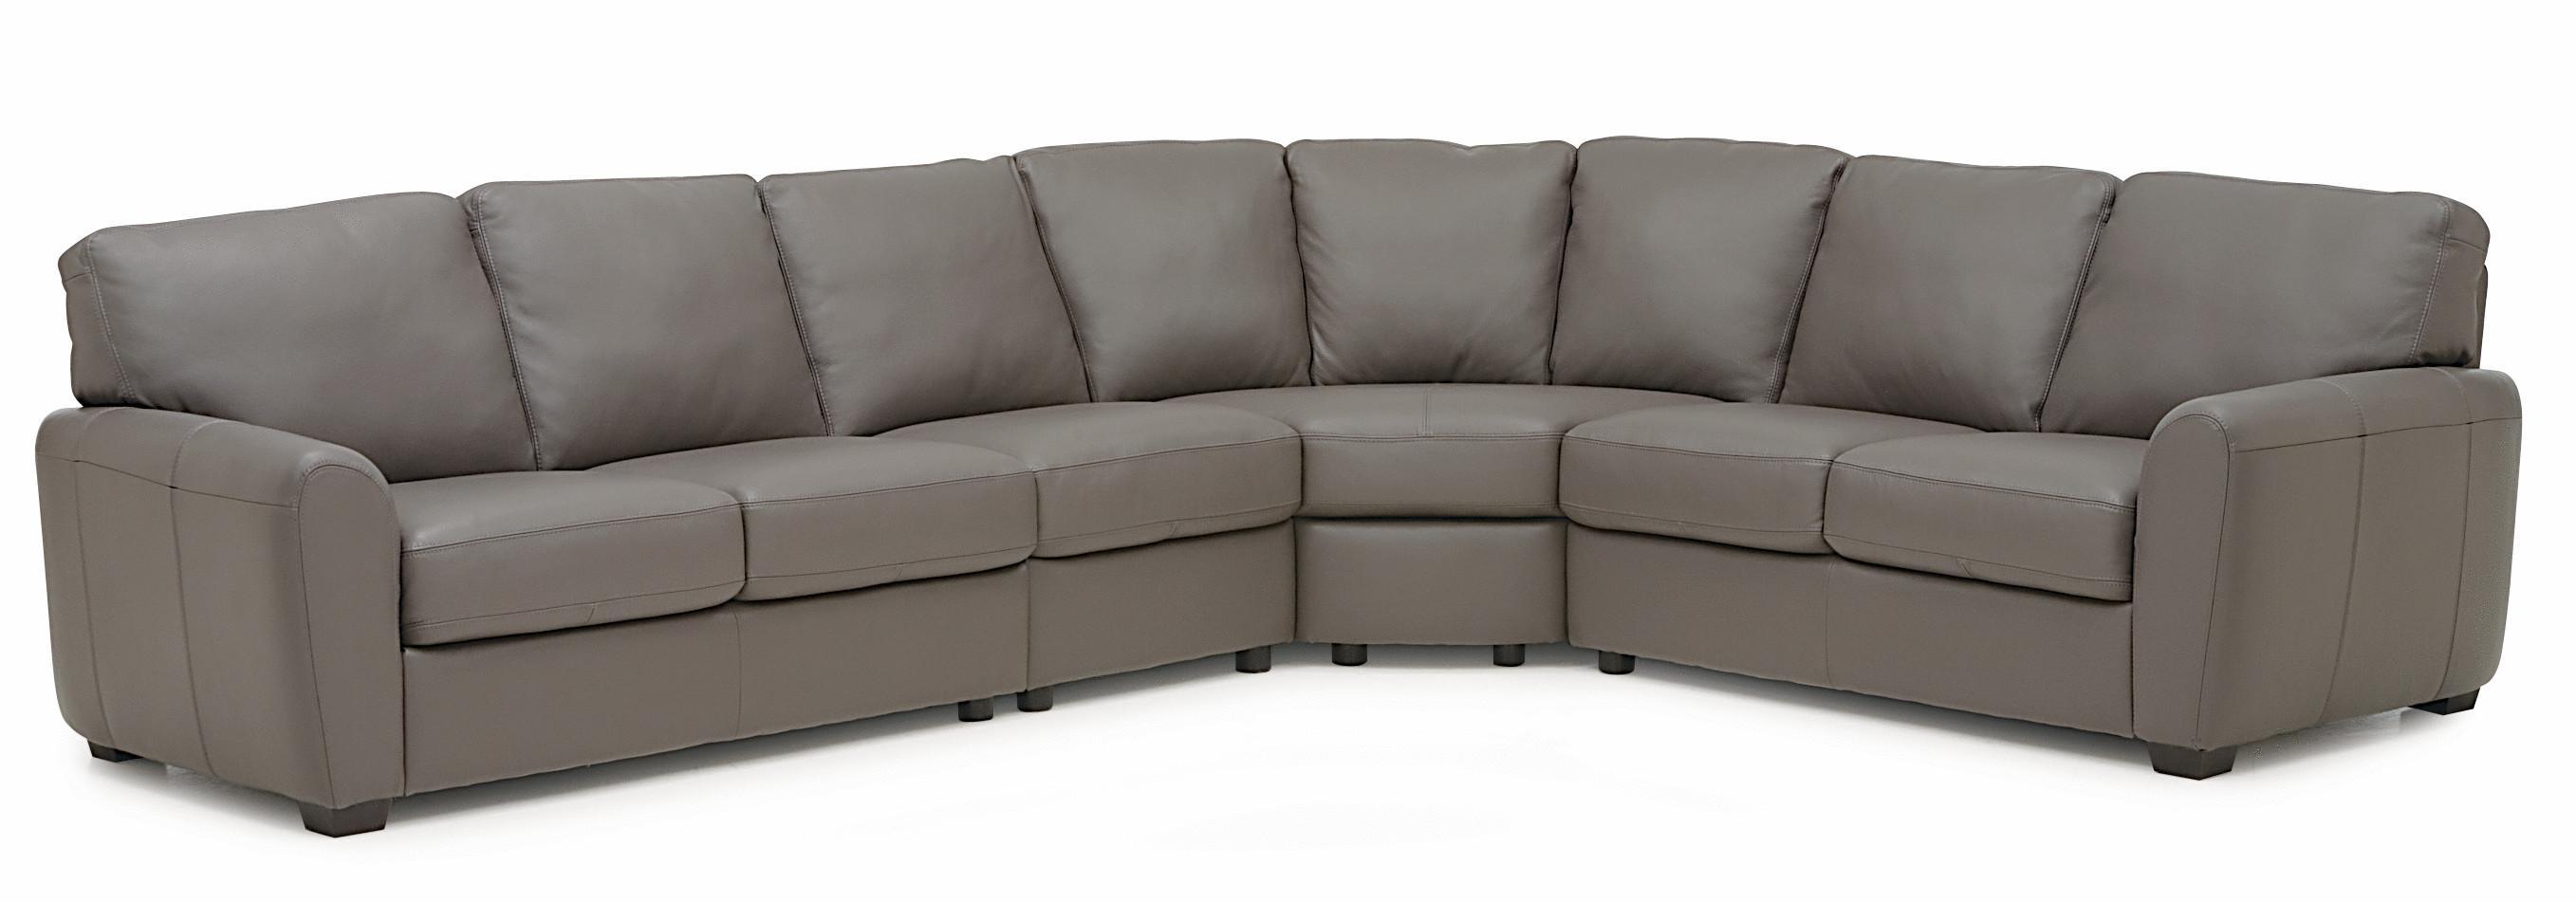 Palliser Connecticut Contemporary Sectional Sofa